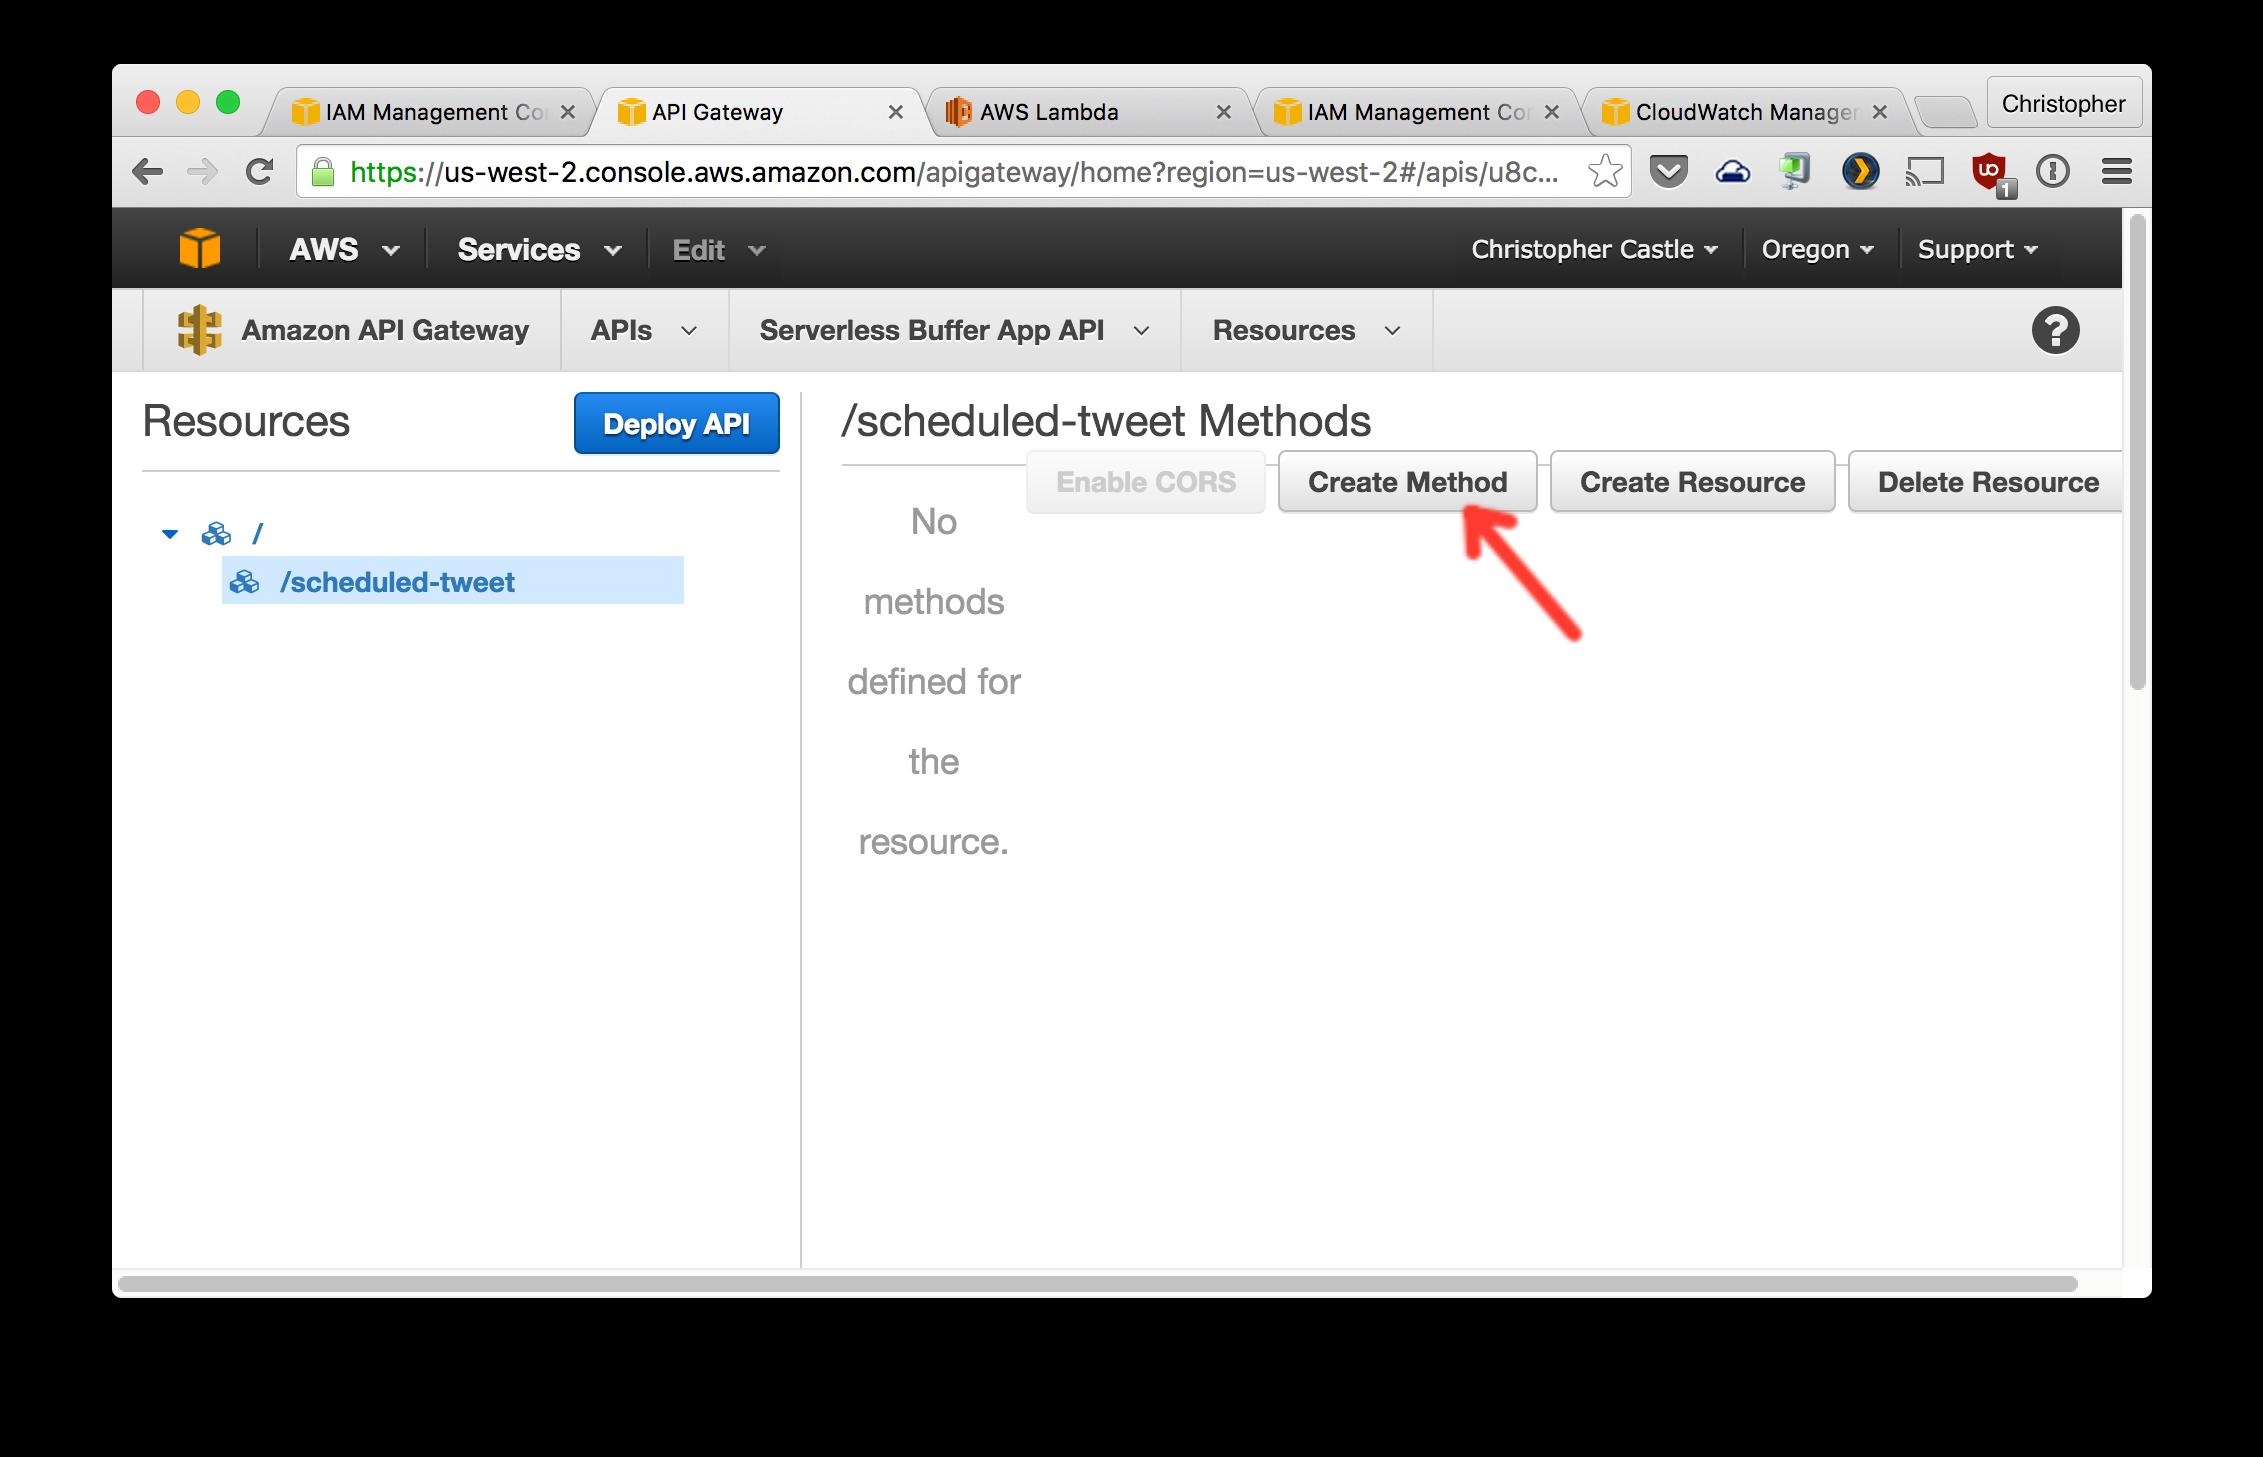 Serverless Buffer App clone